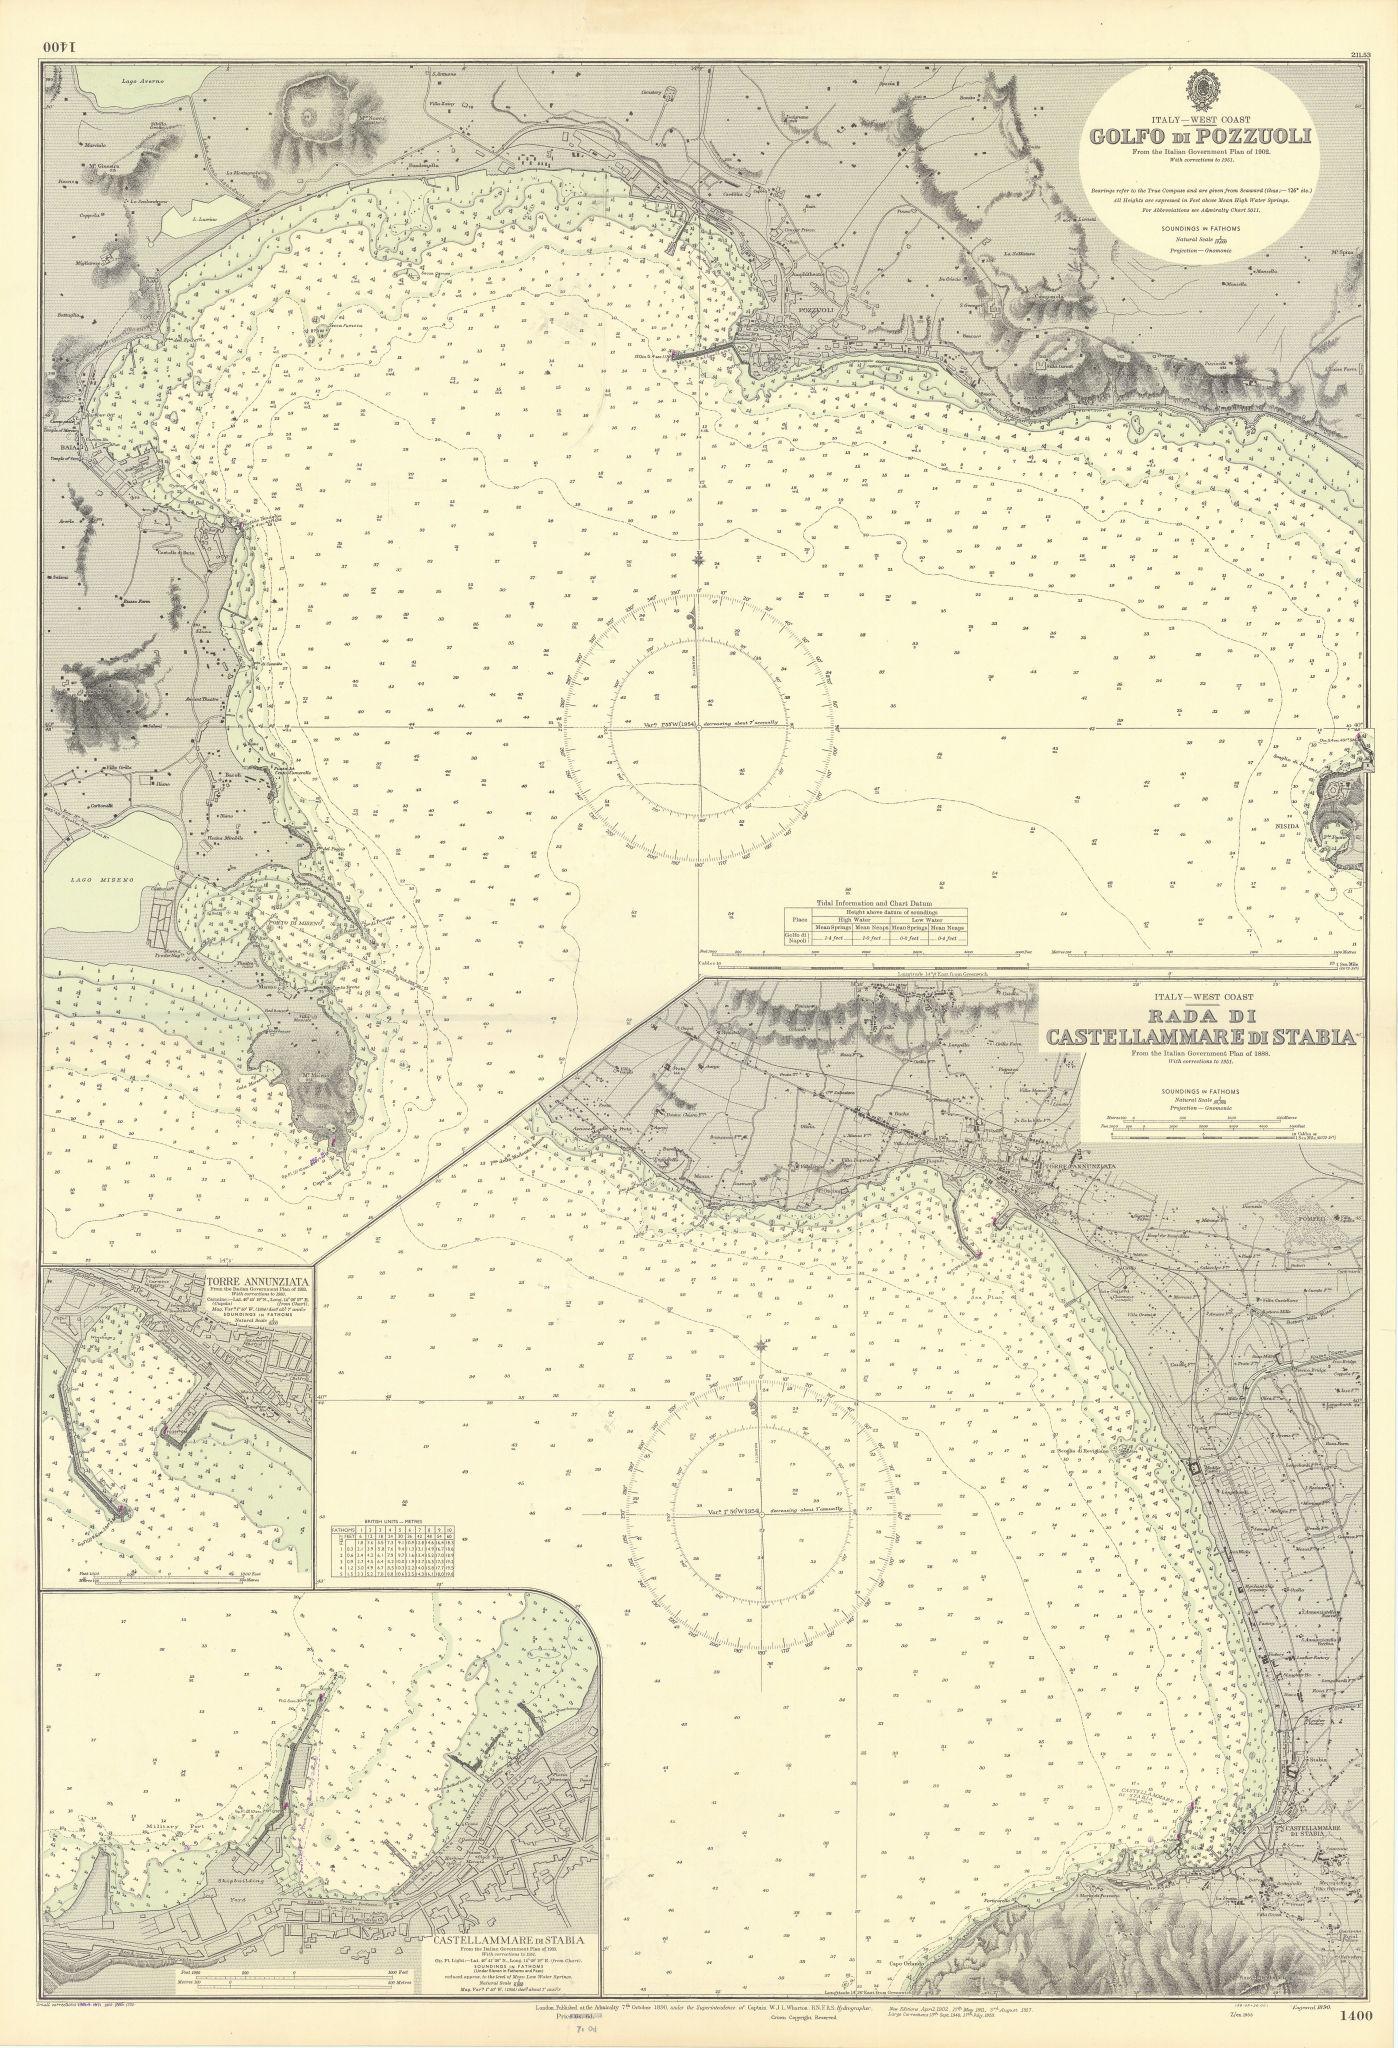 Gulf of Naples Pozzuoli Castellammare Stabia ADMIRALTY sea chart 1890 (1955) map